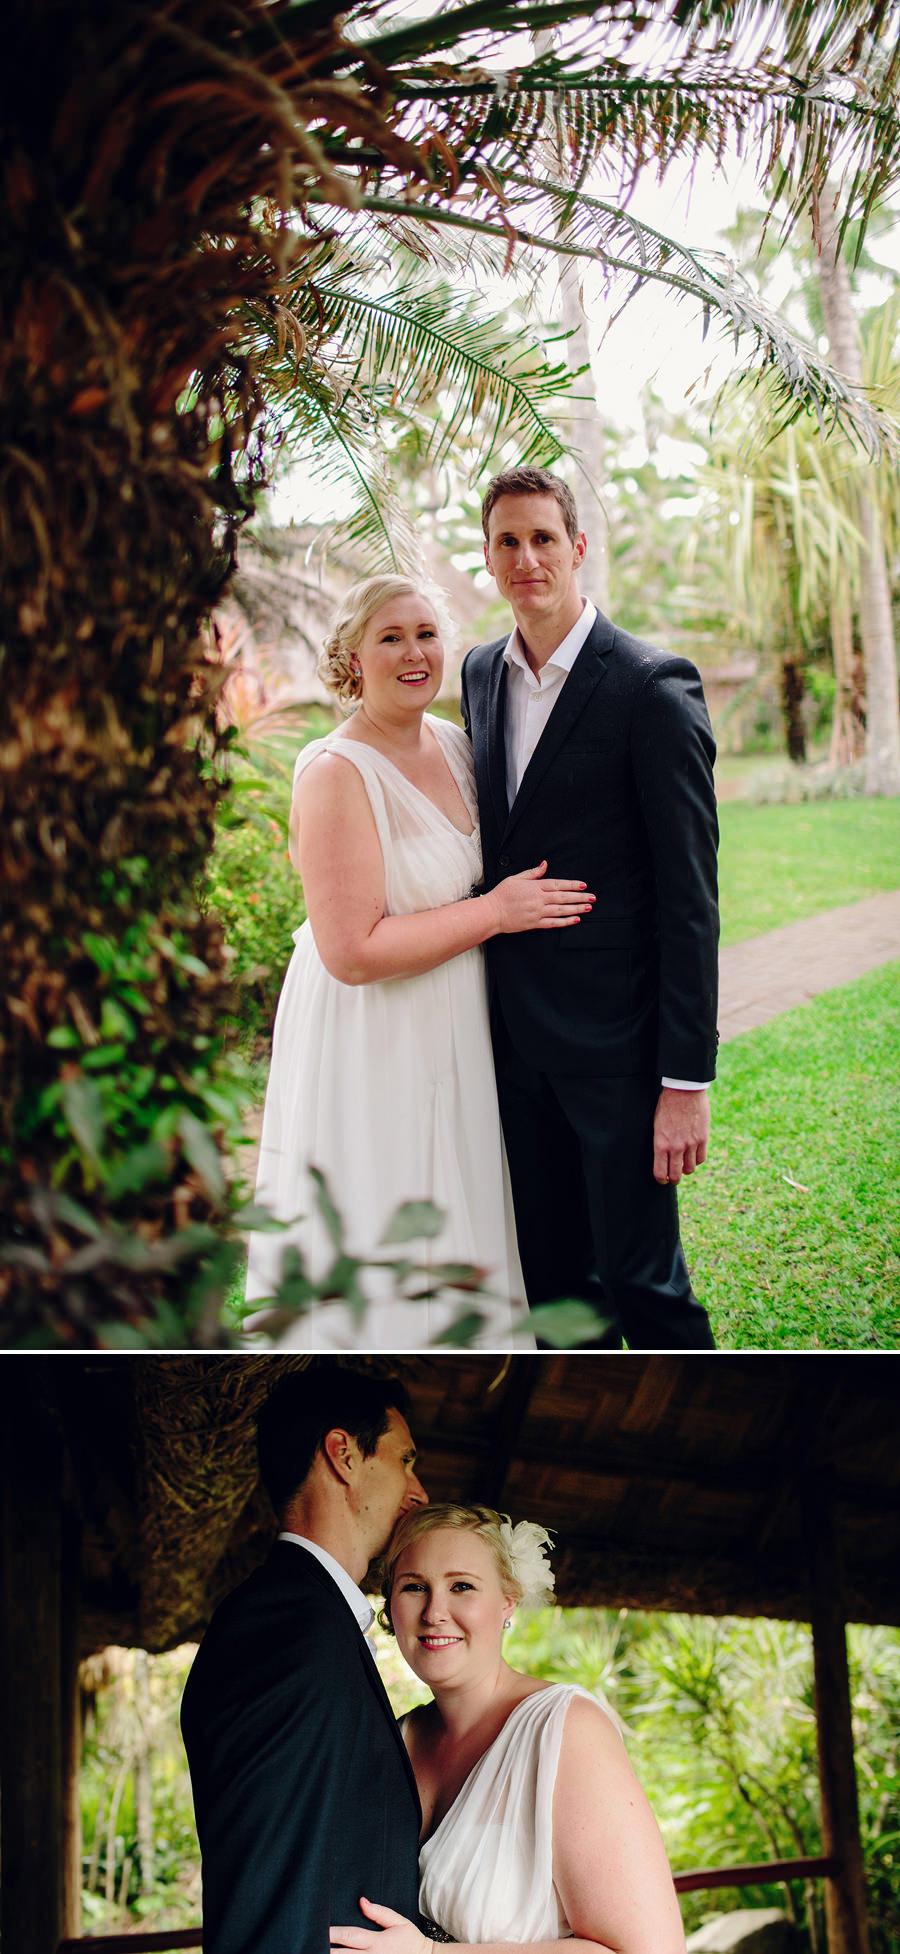 Destination Wedding Photography: First look